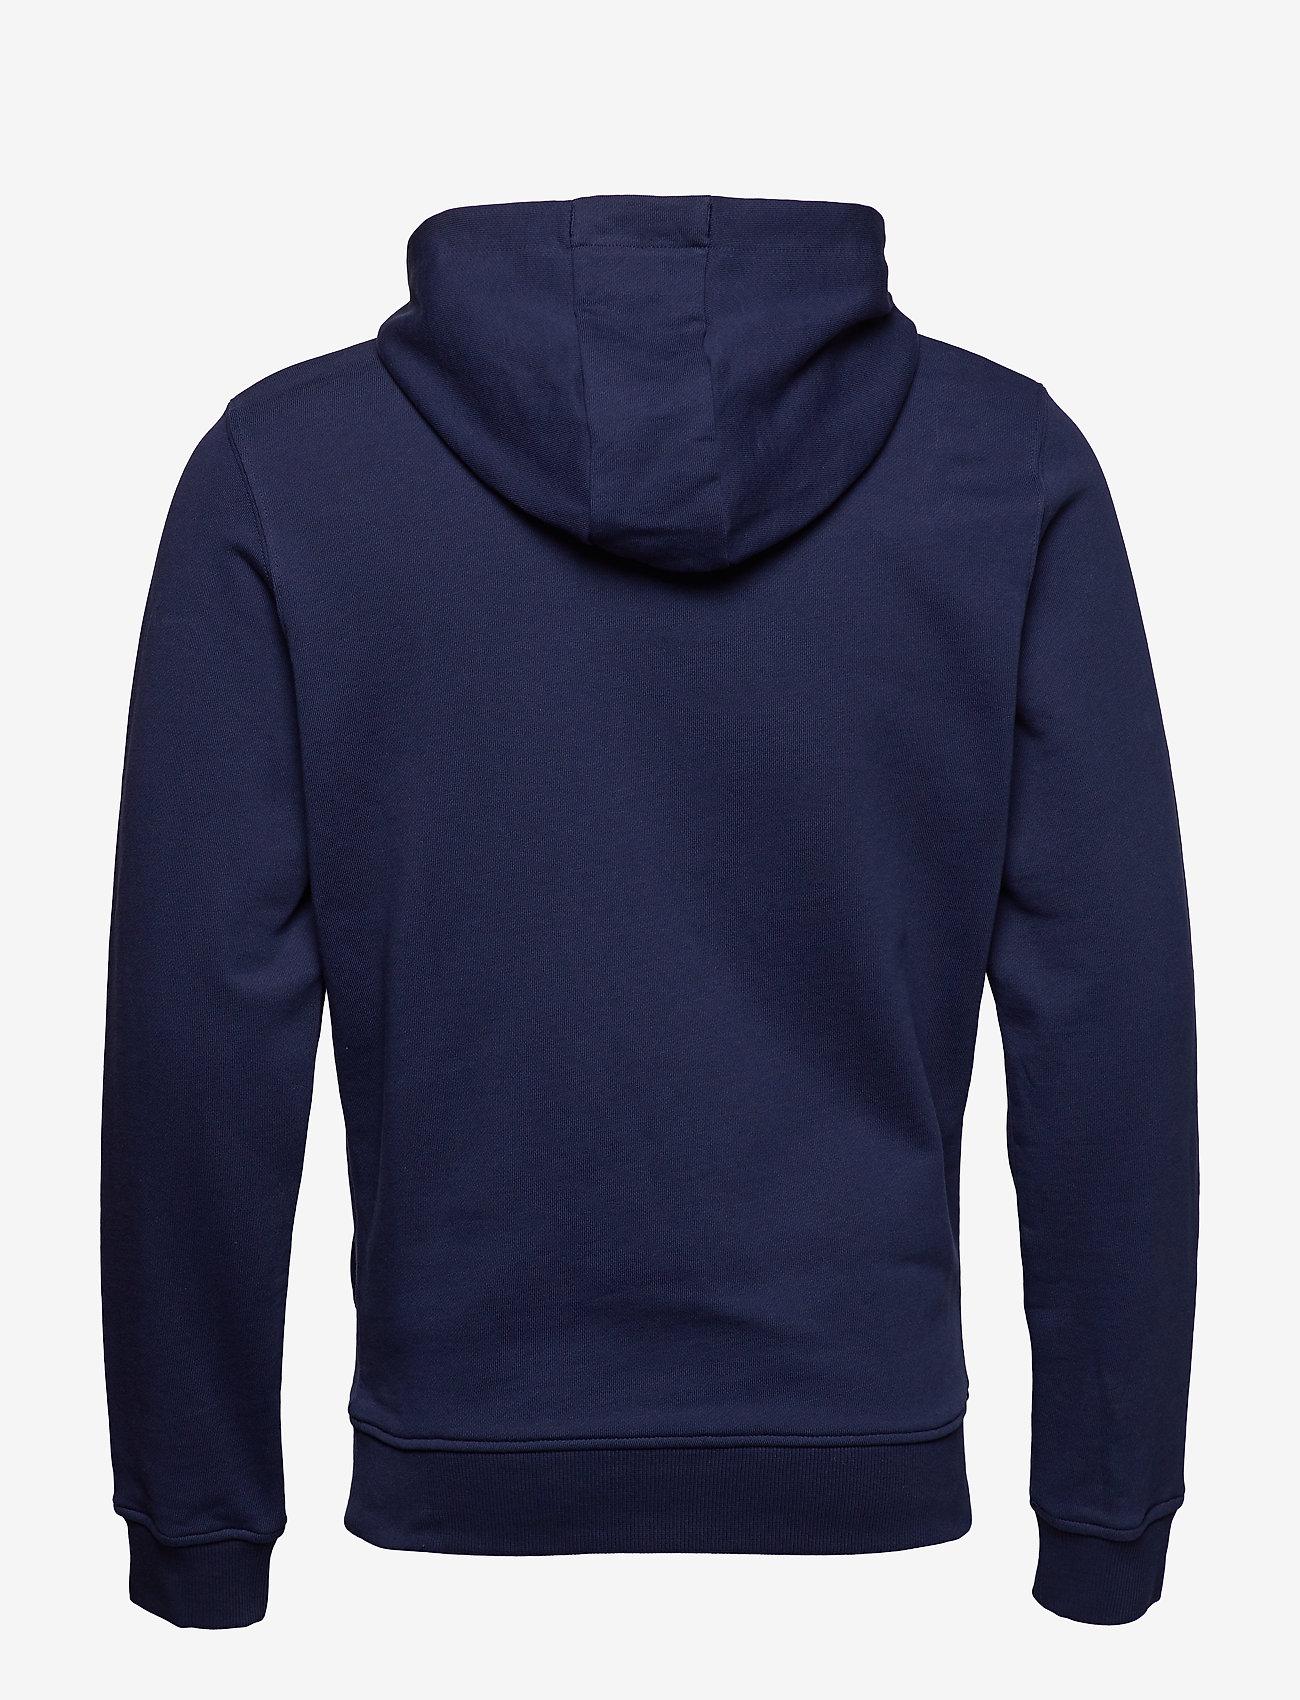 Lyle & Scott Pullover Hoodie - Sweatshirts NAVY - Menn Klær